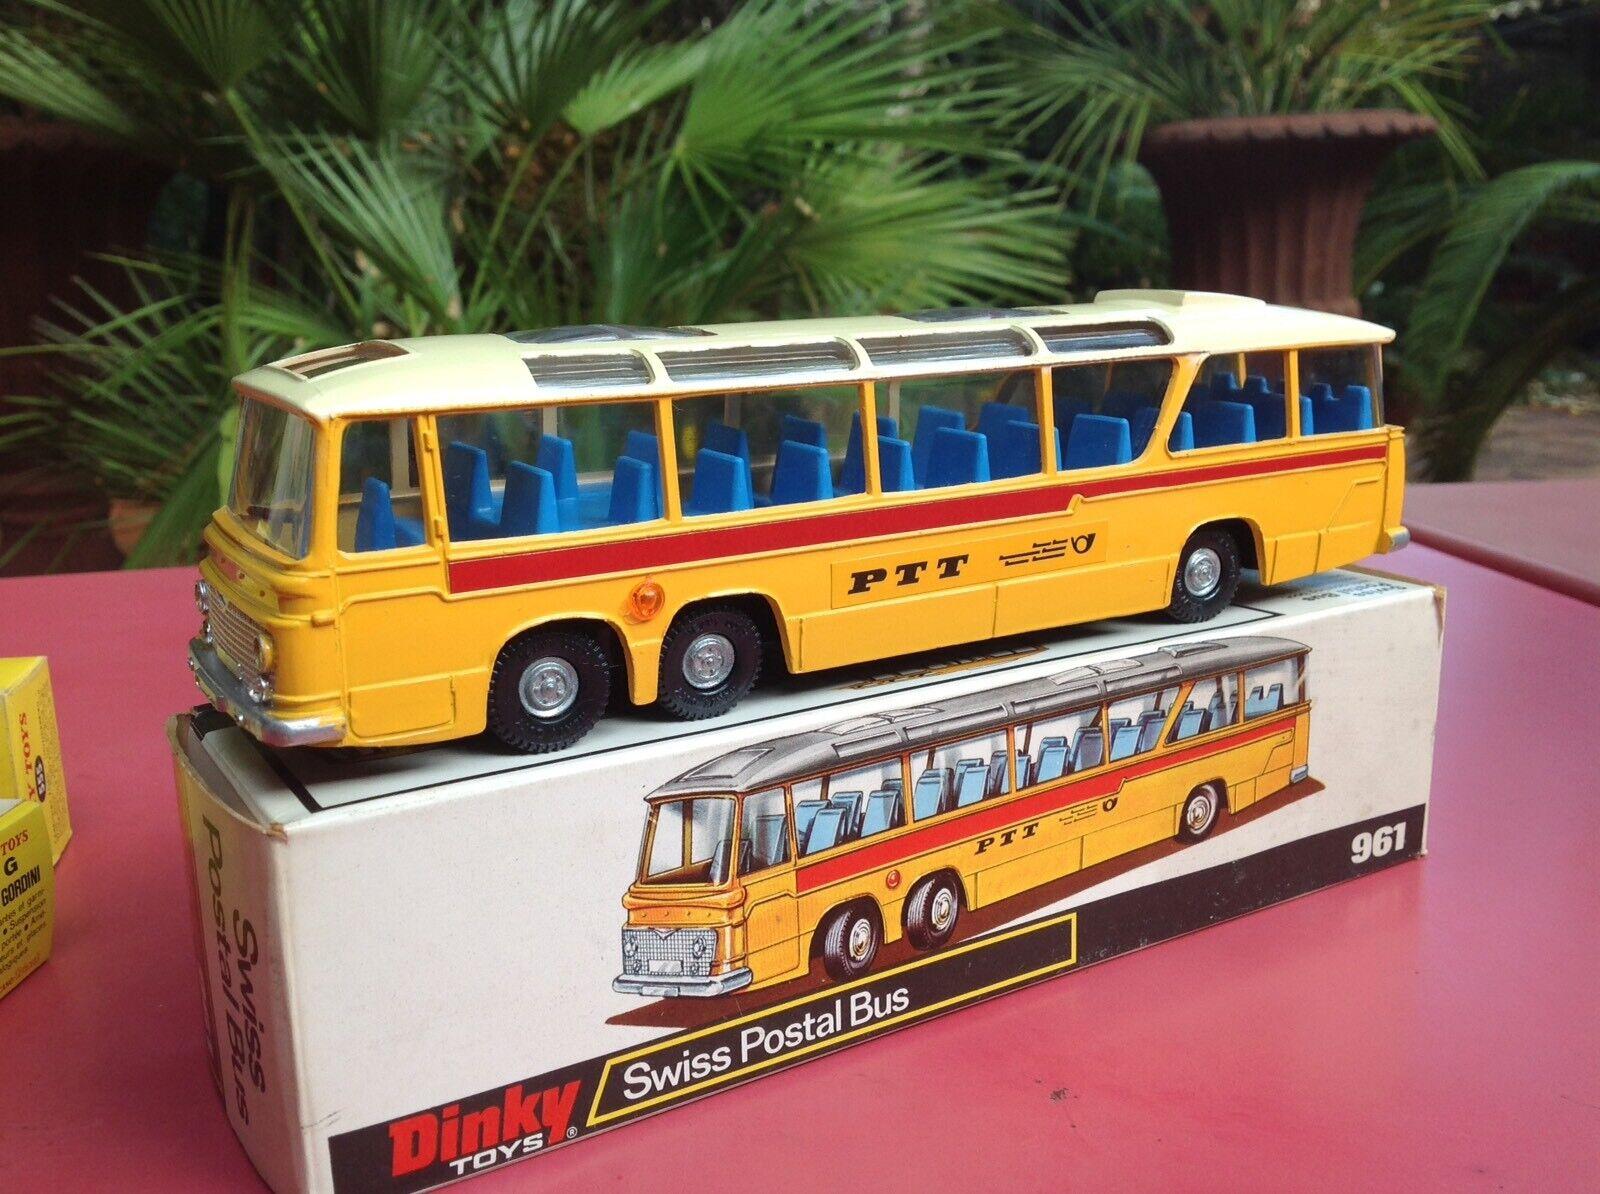 Dinky giocattoli Réf 961 Swiss Postal autobus Vega major Autoauto PTT  Mint in original scatola